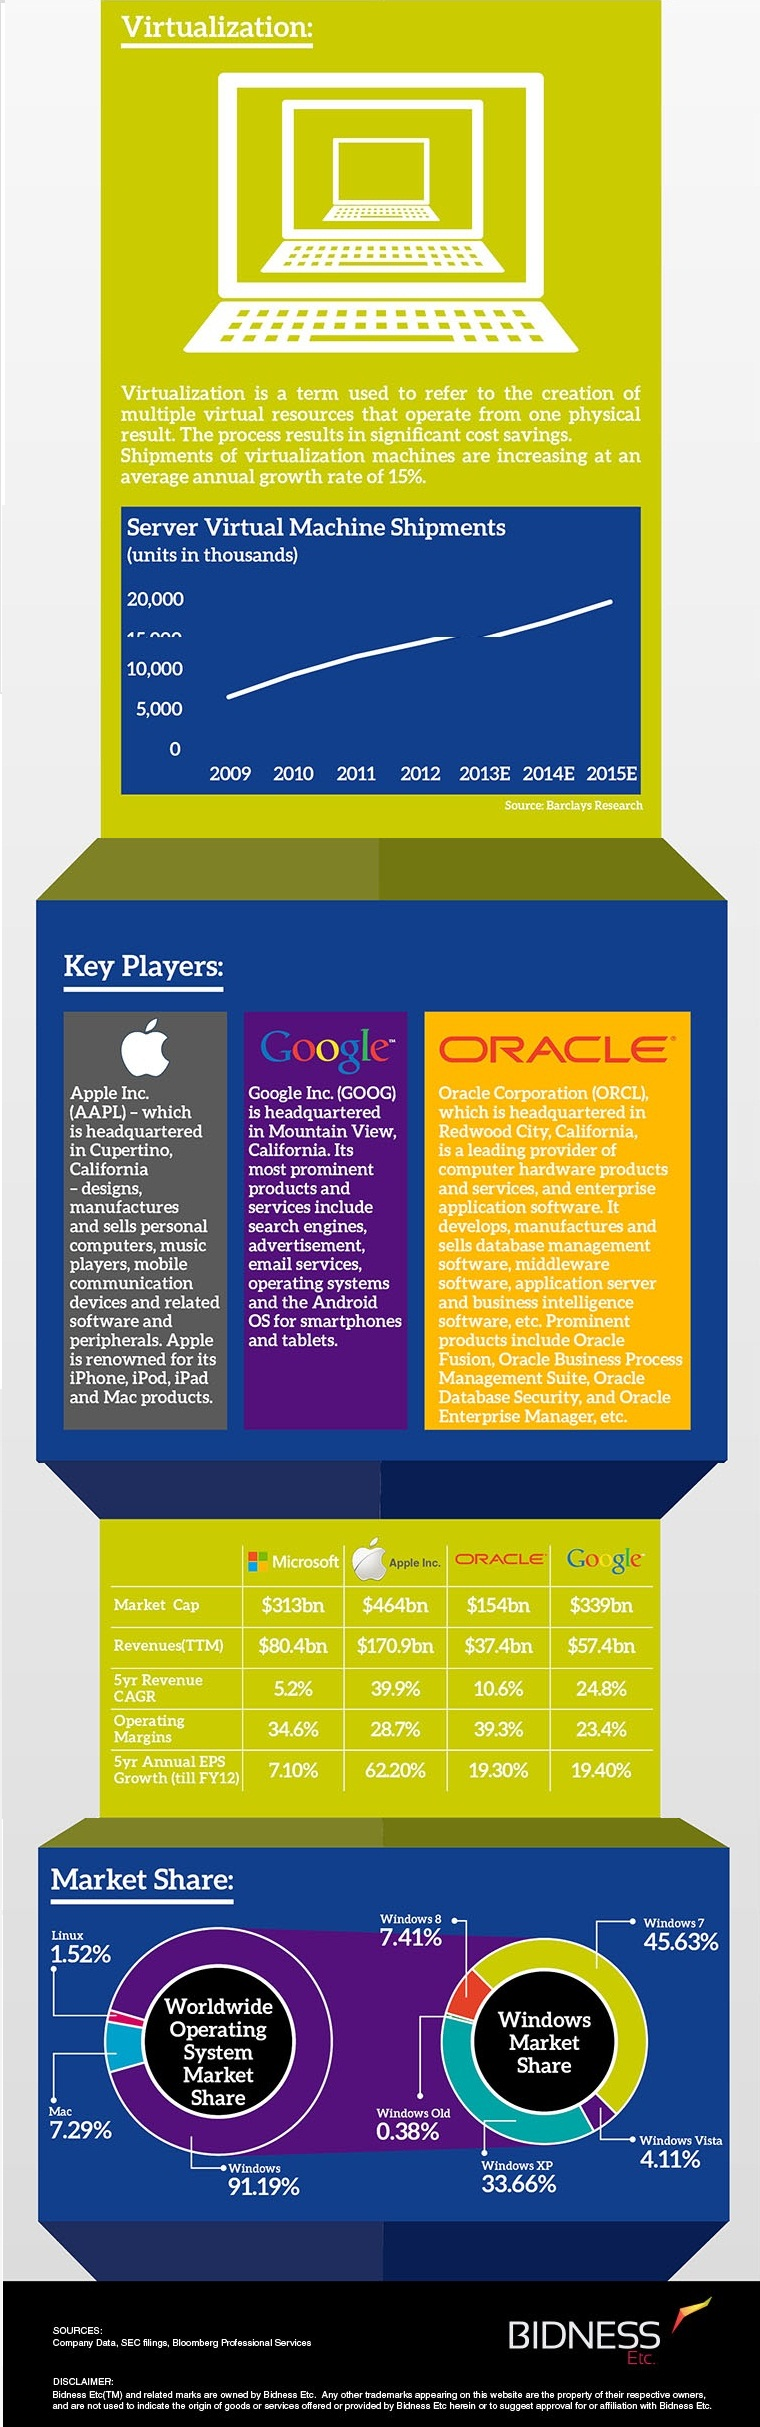 Microsoft Industry Analysis